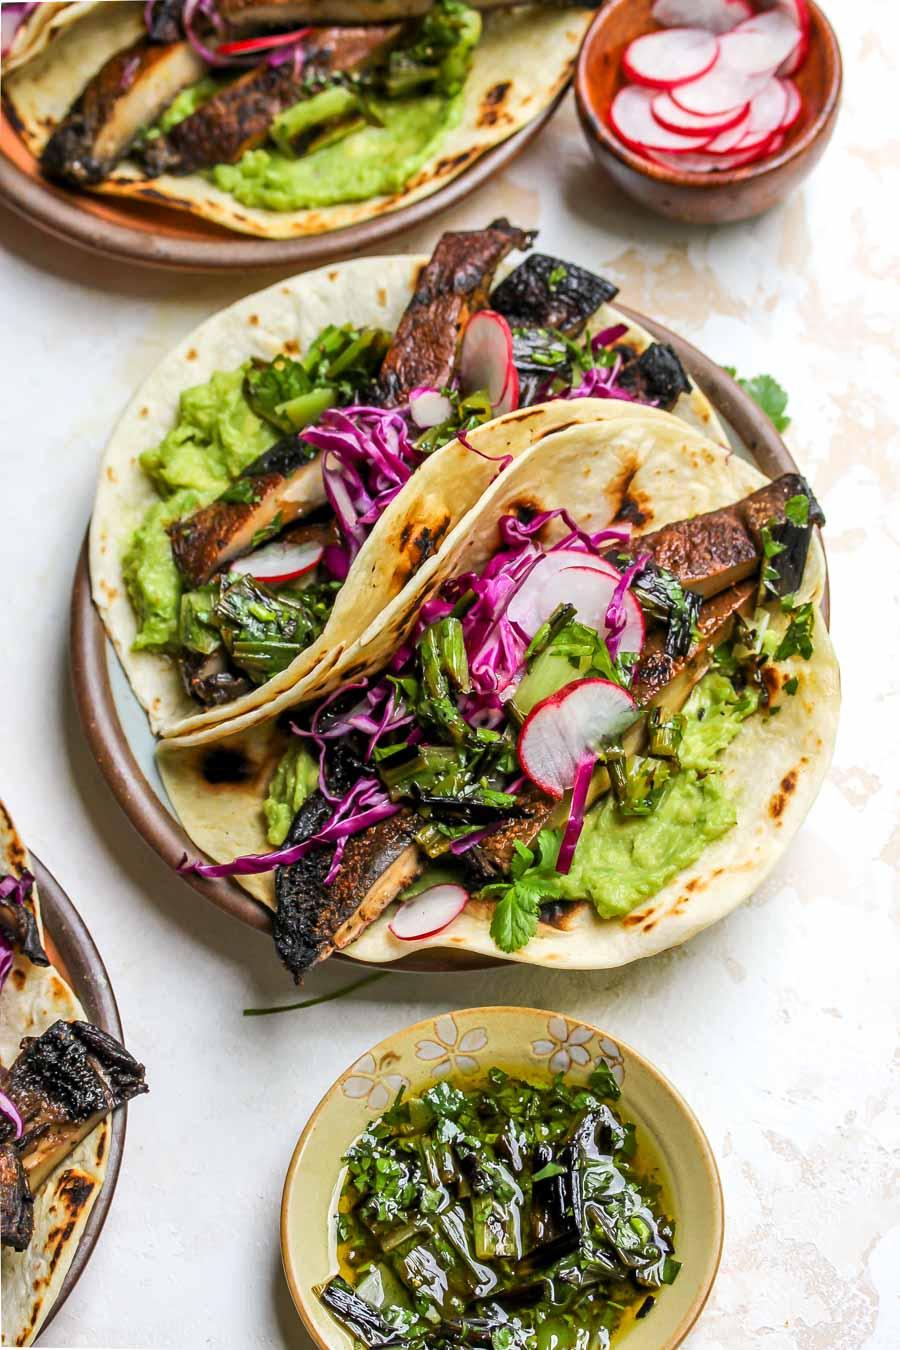 Portobello Mushroom Tacos with Charred Scallion Salsa